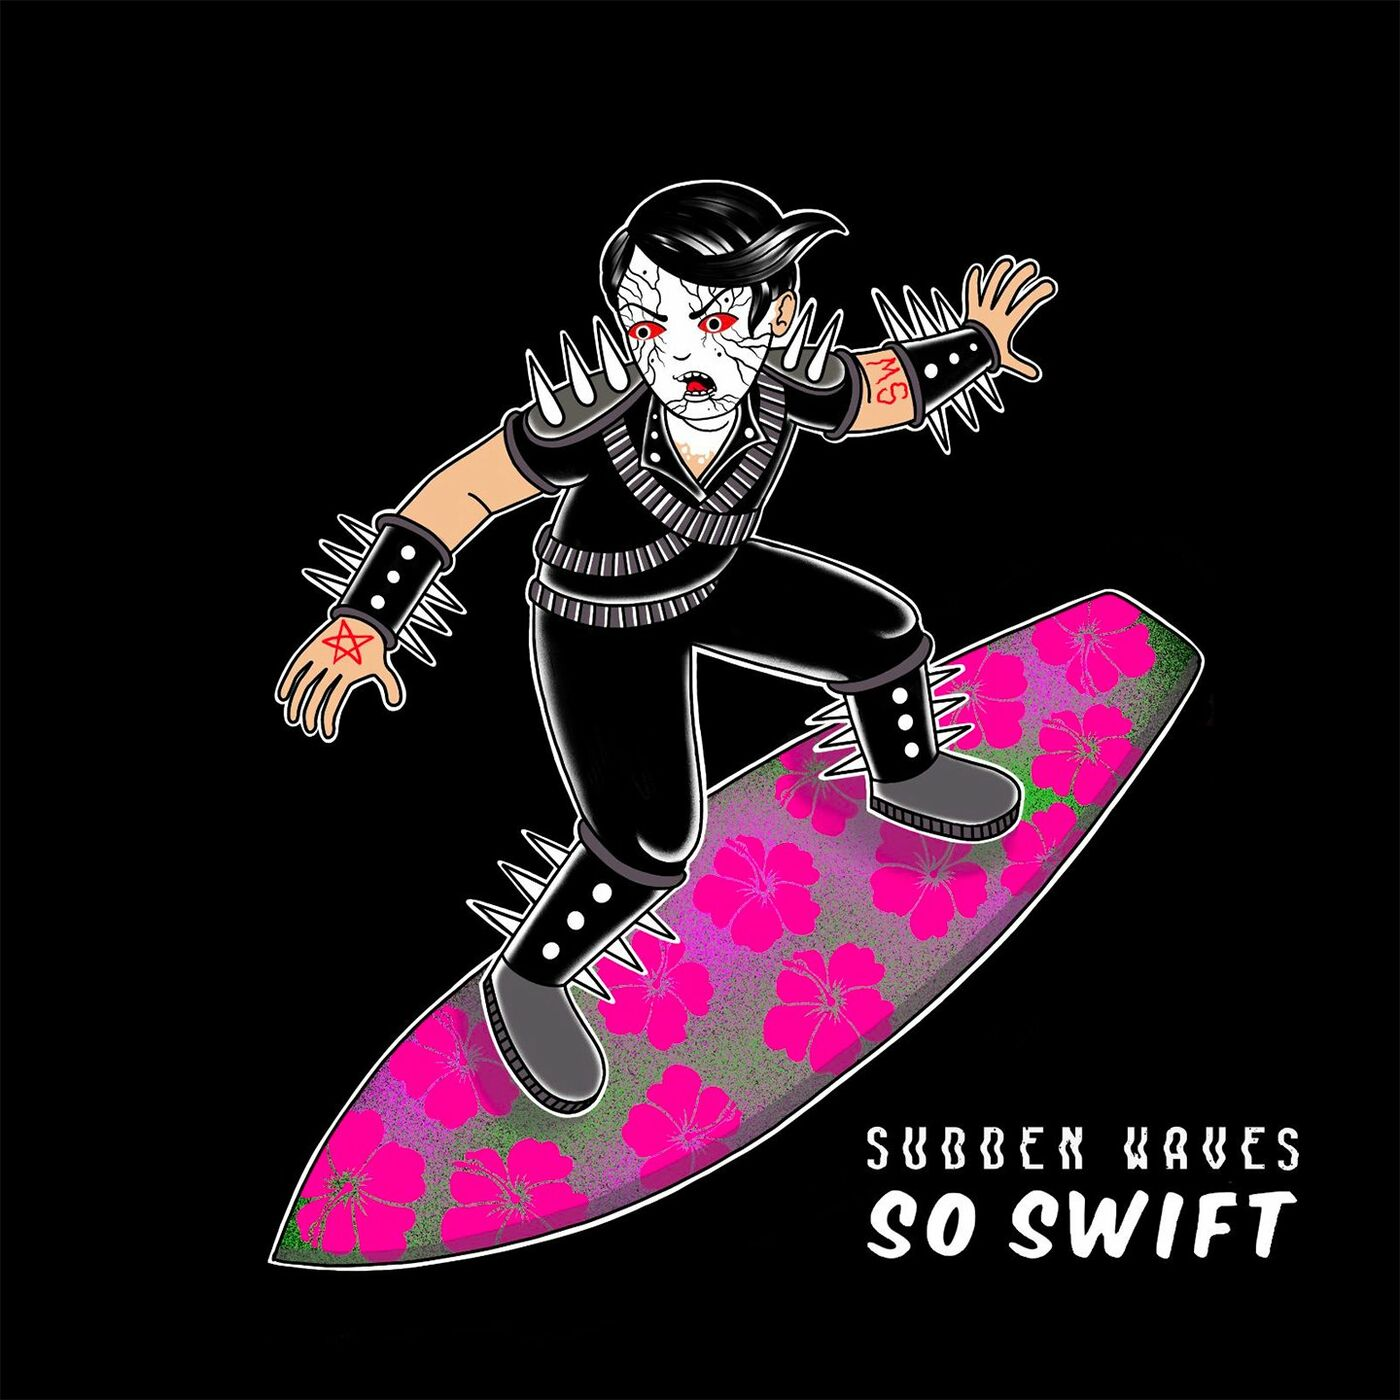 Sudden Waves - So Swift [single] (2020)